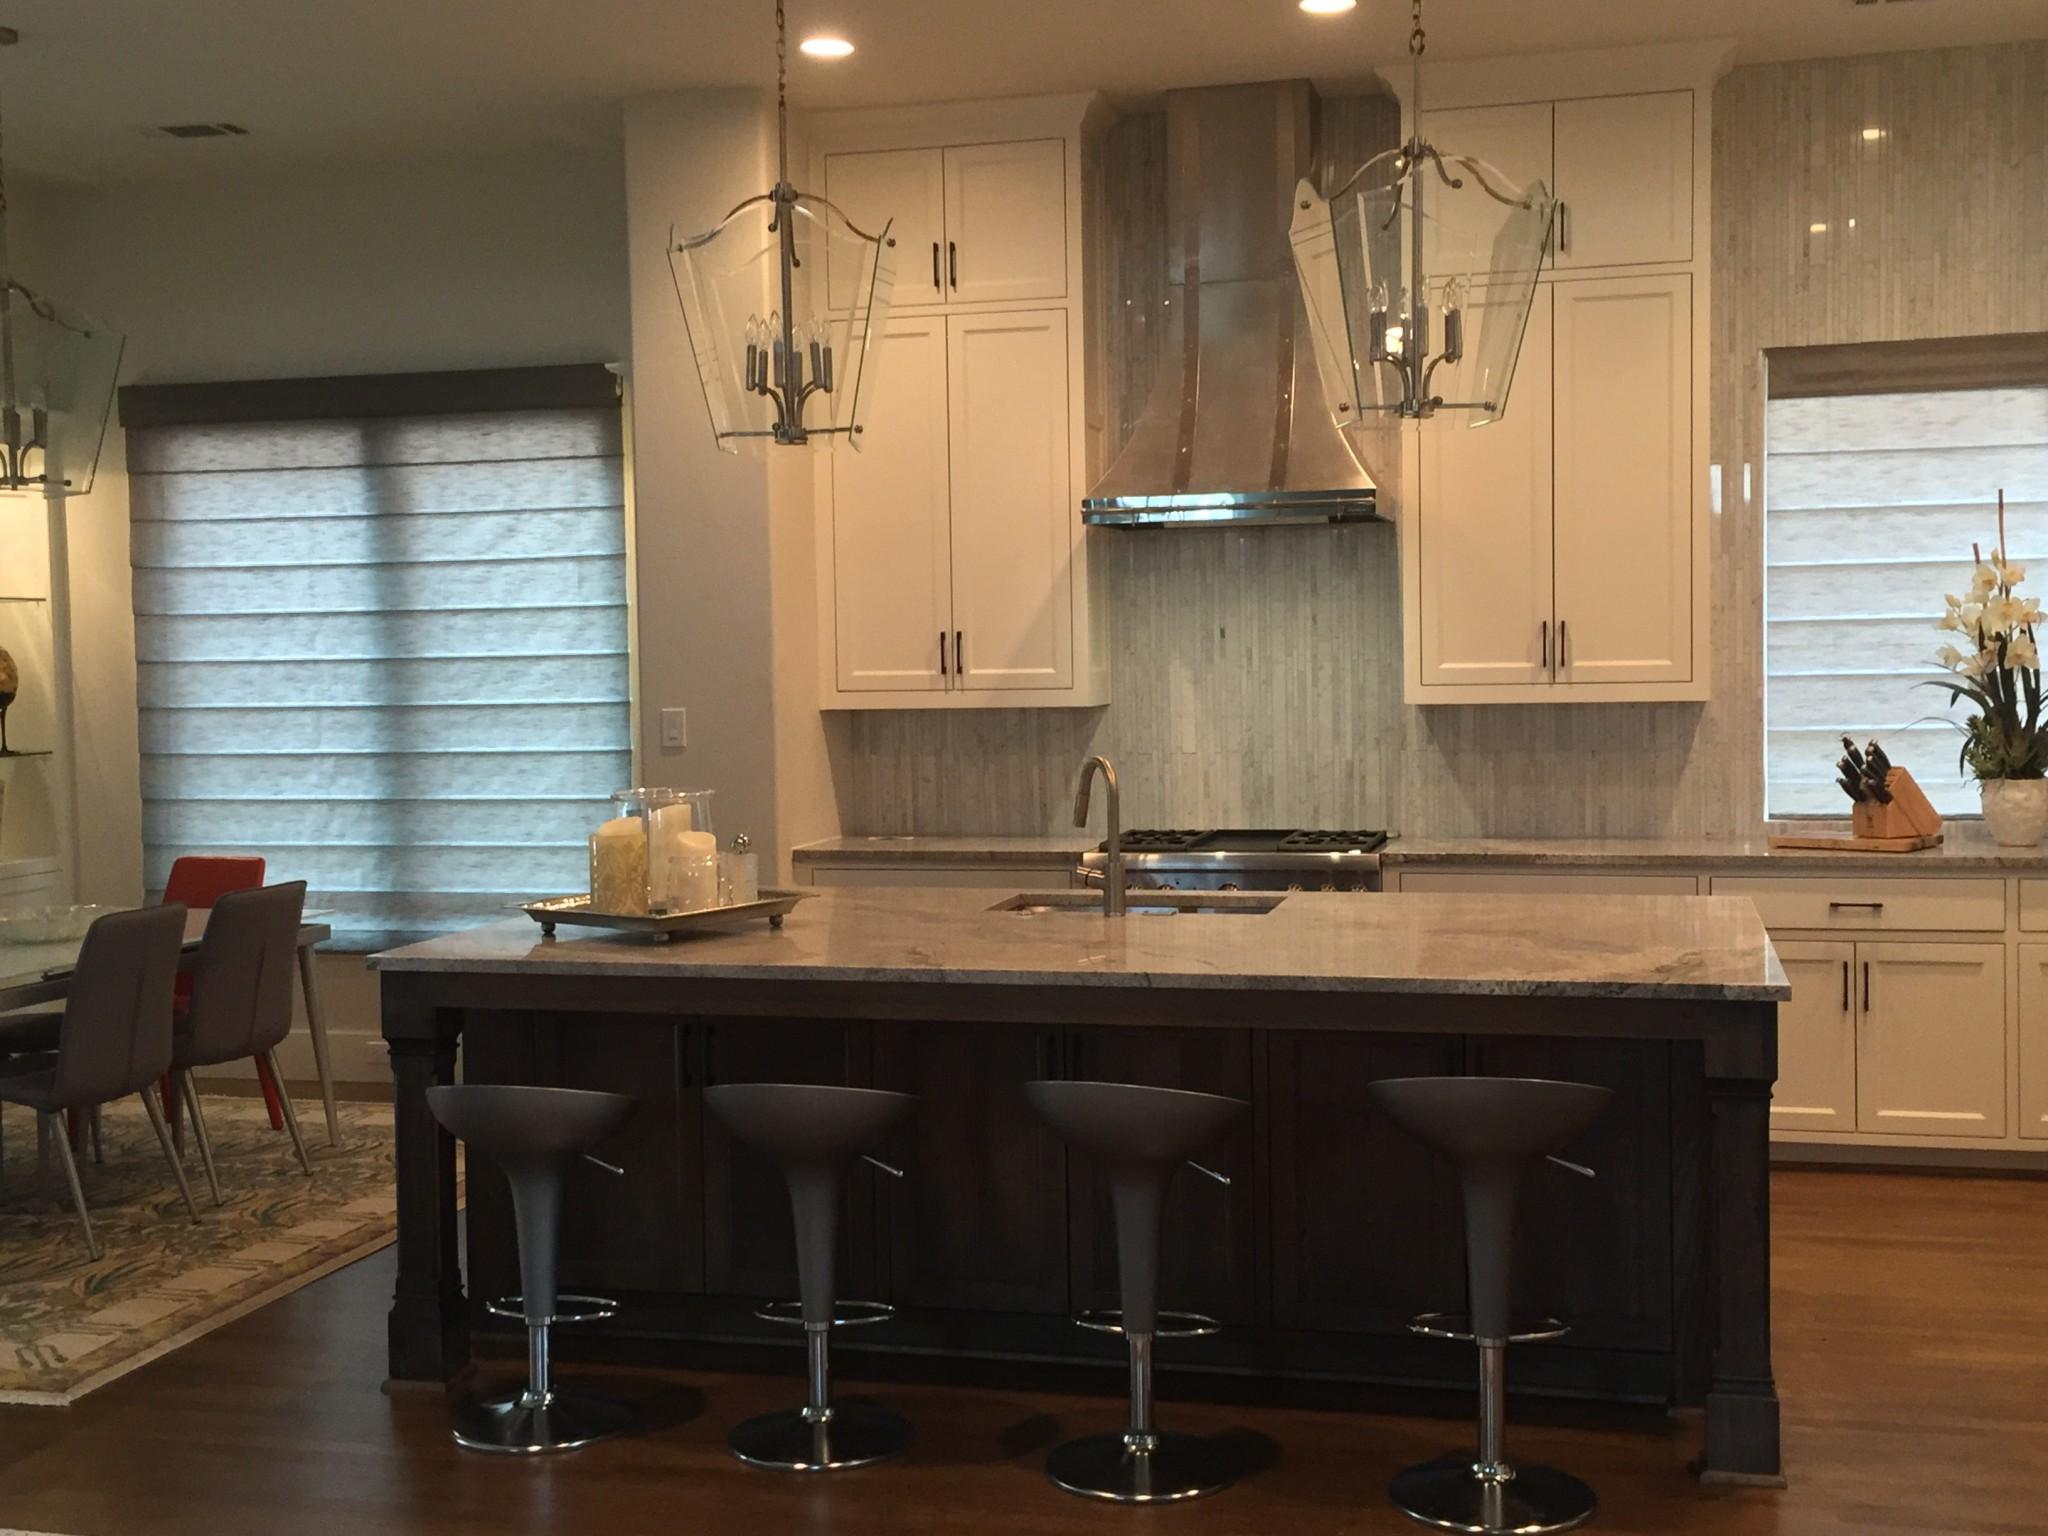 Modern Kitchen Mosaic modern-kitchen-bar-stone-mosaic-backsplash – palmer davis design, llc